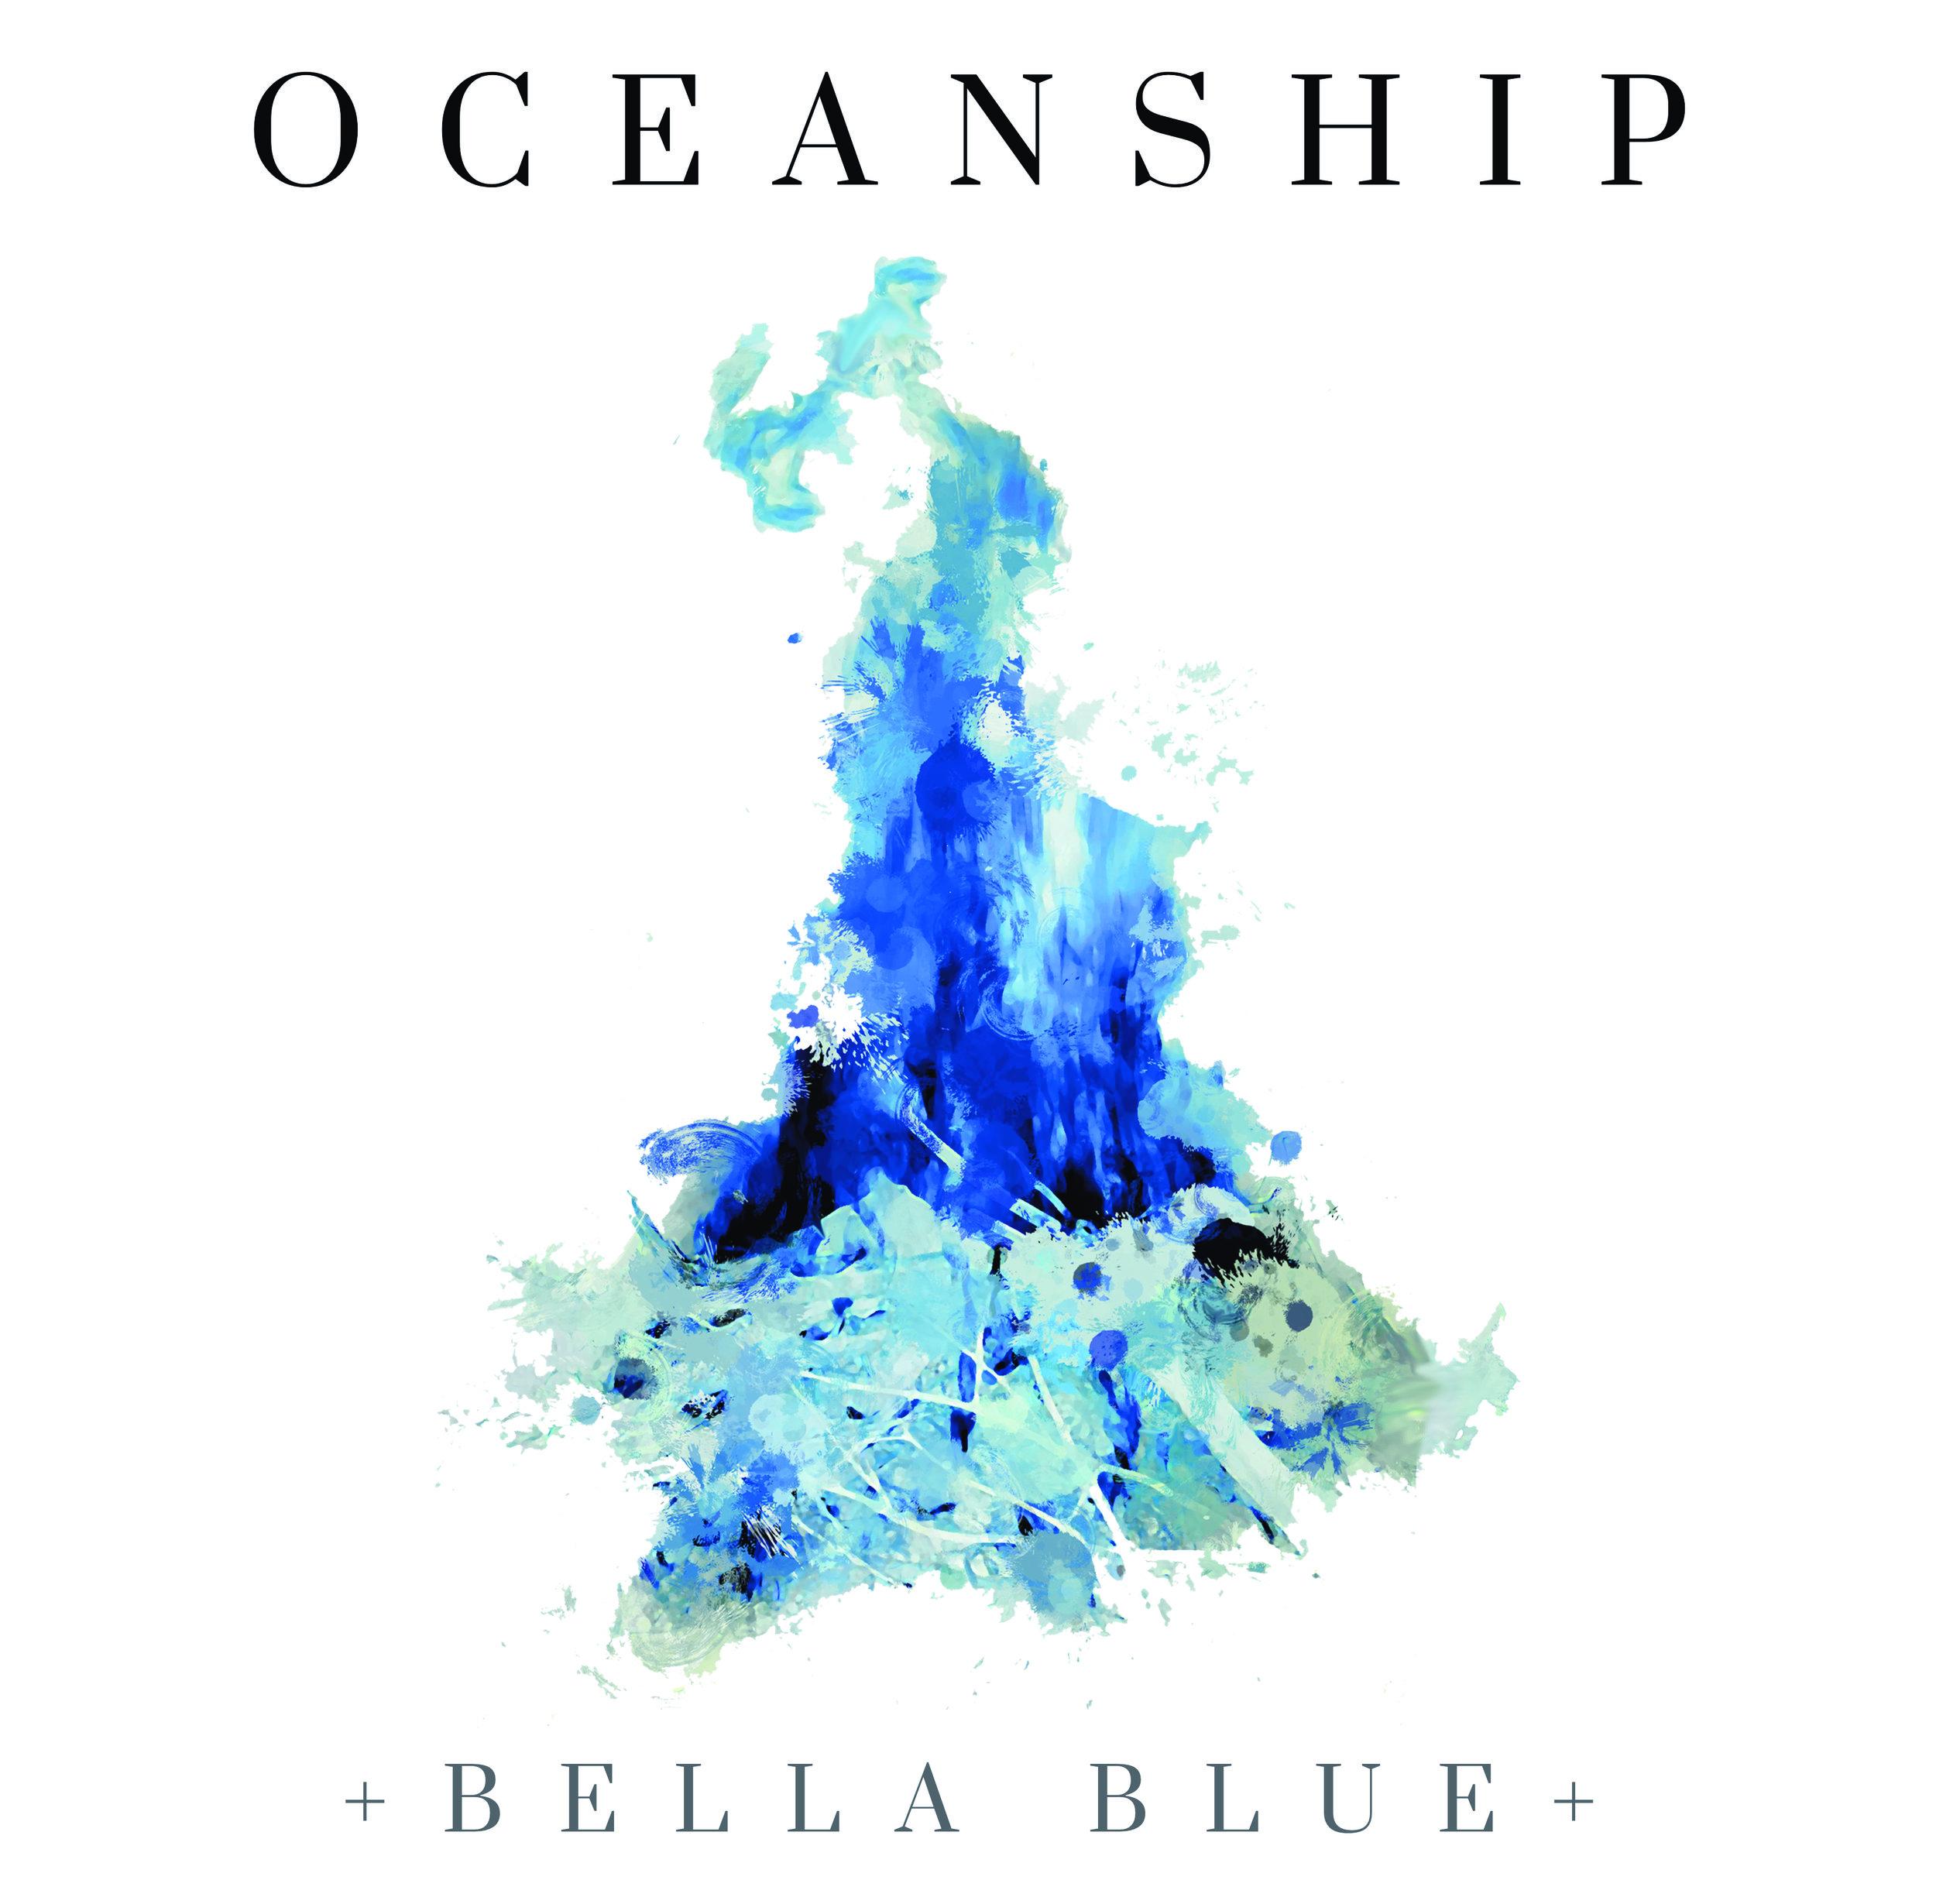 Bella Blue - CD Booklet (muted blue).jpeg